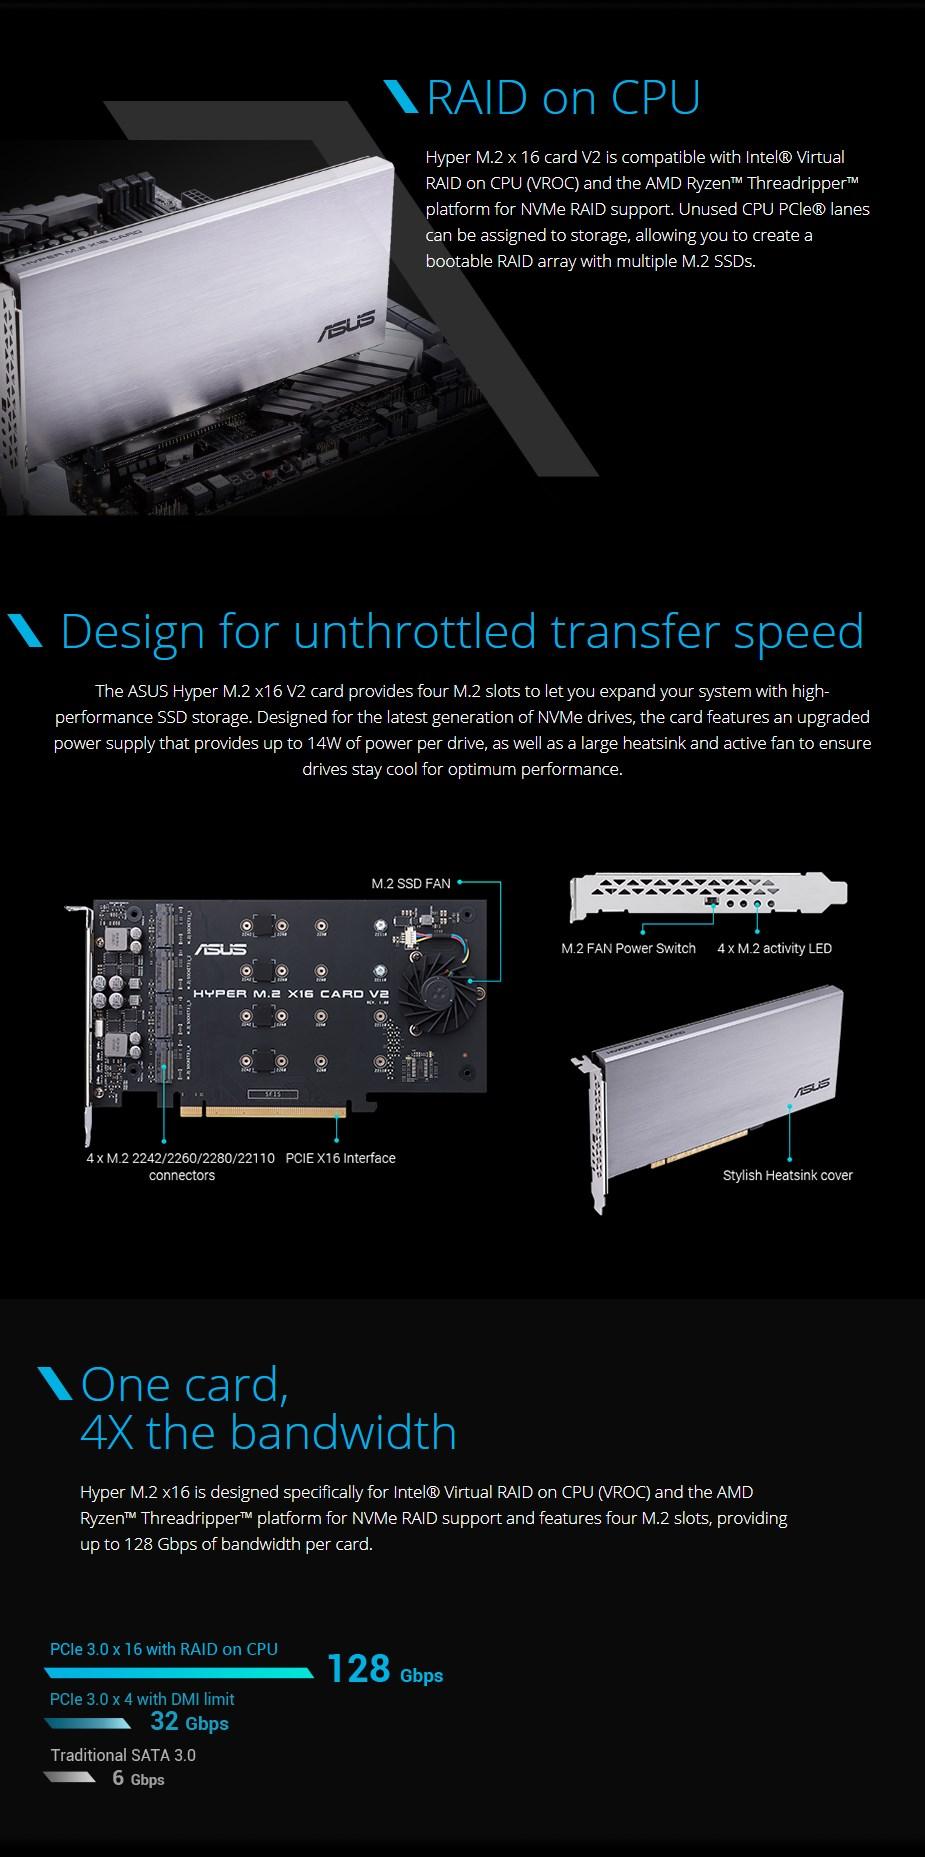 asus-hyper-m2-x16-card-v2-raid-card-ac28725-6.jpg